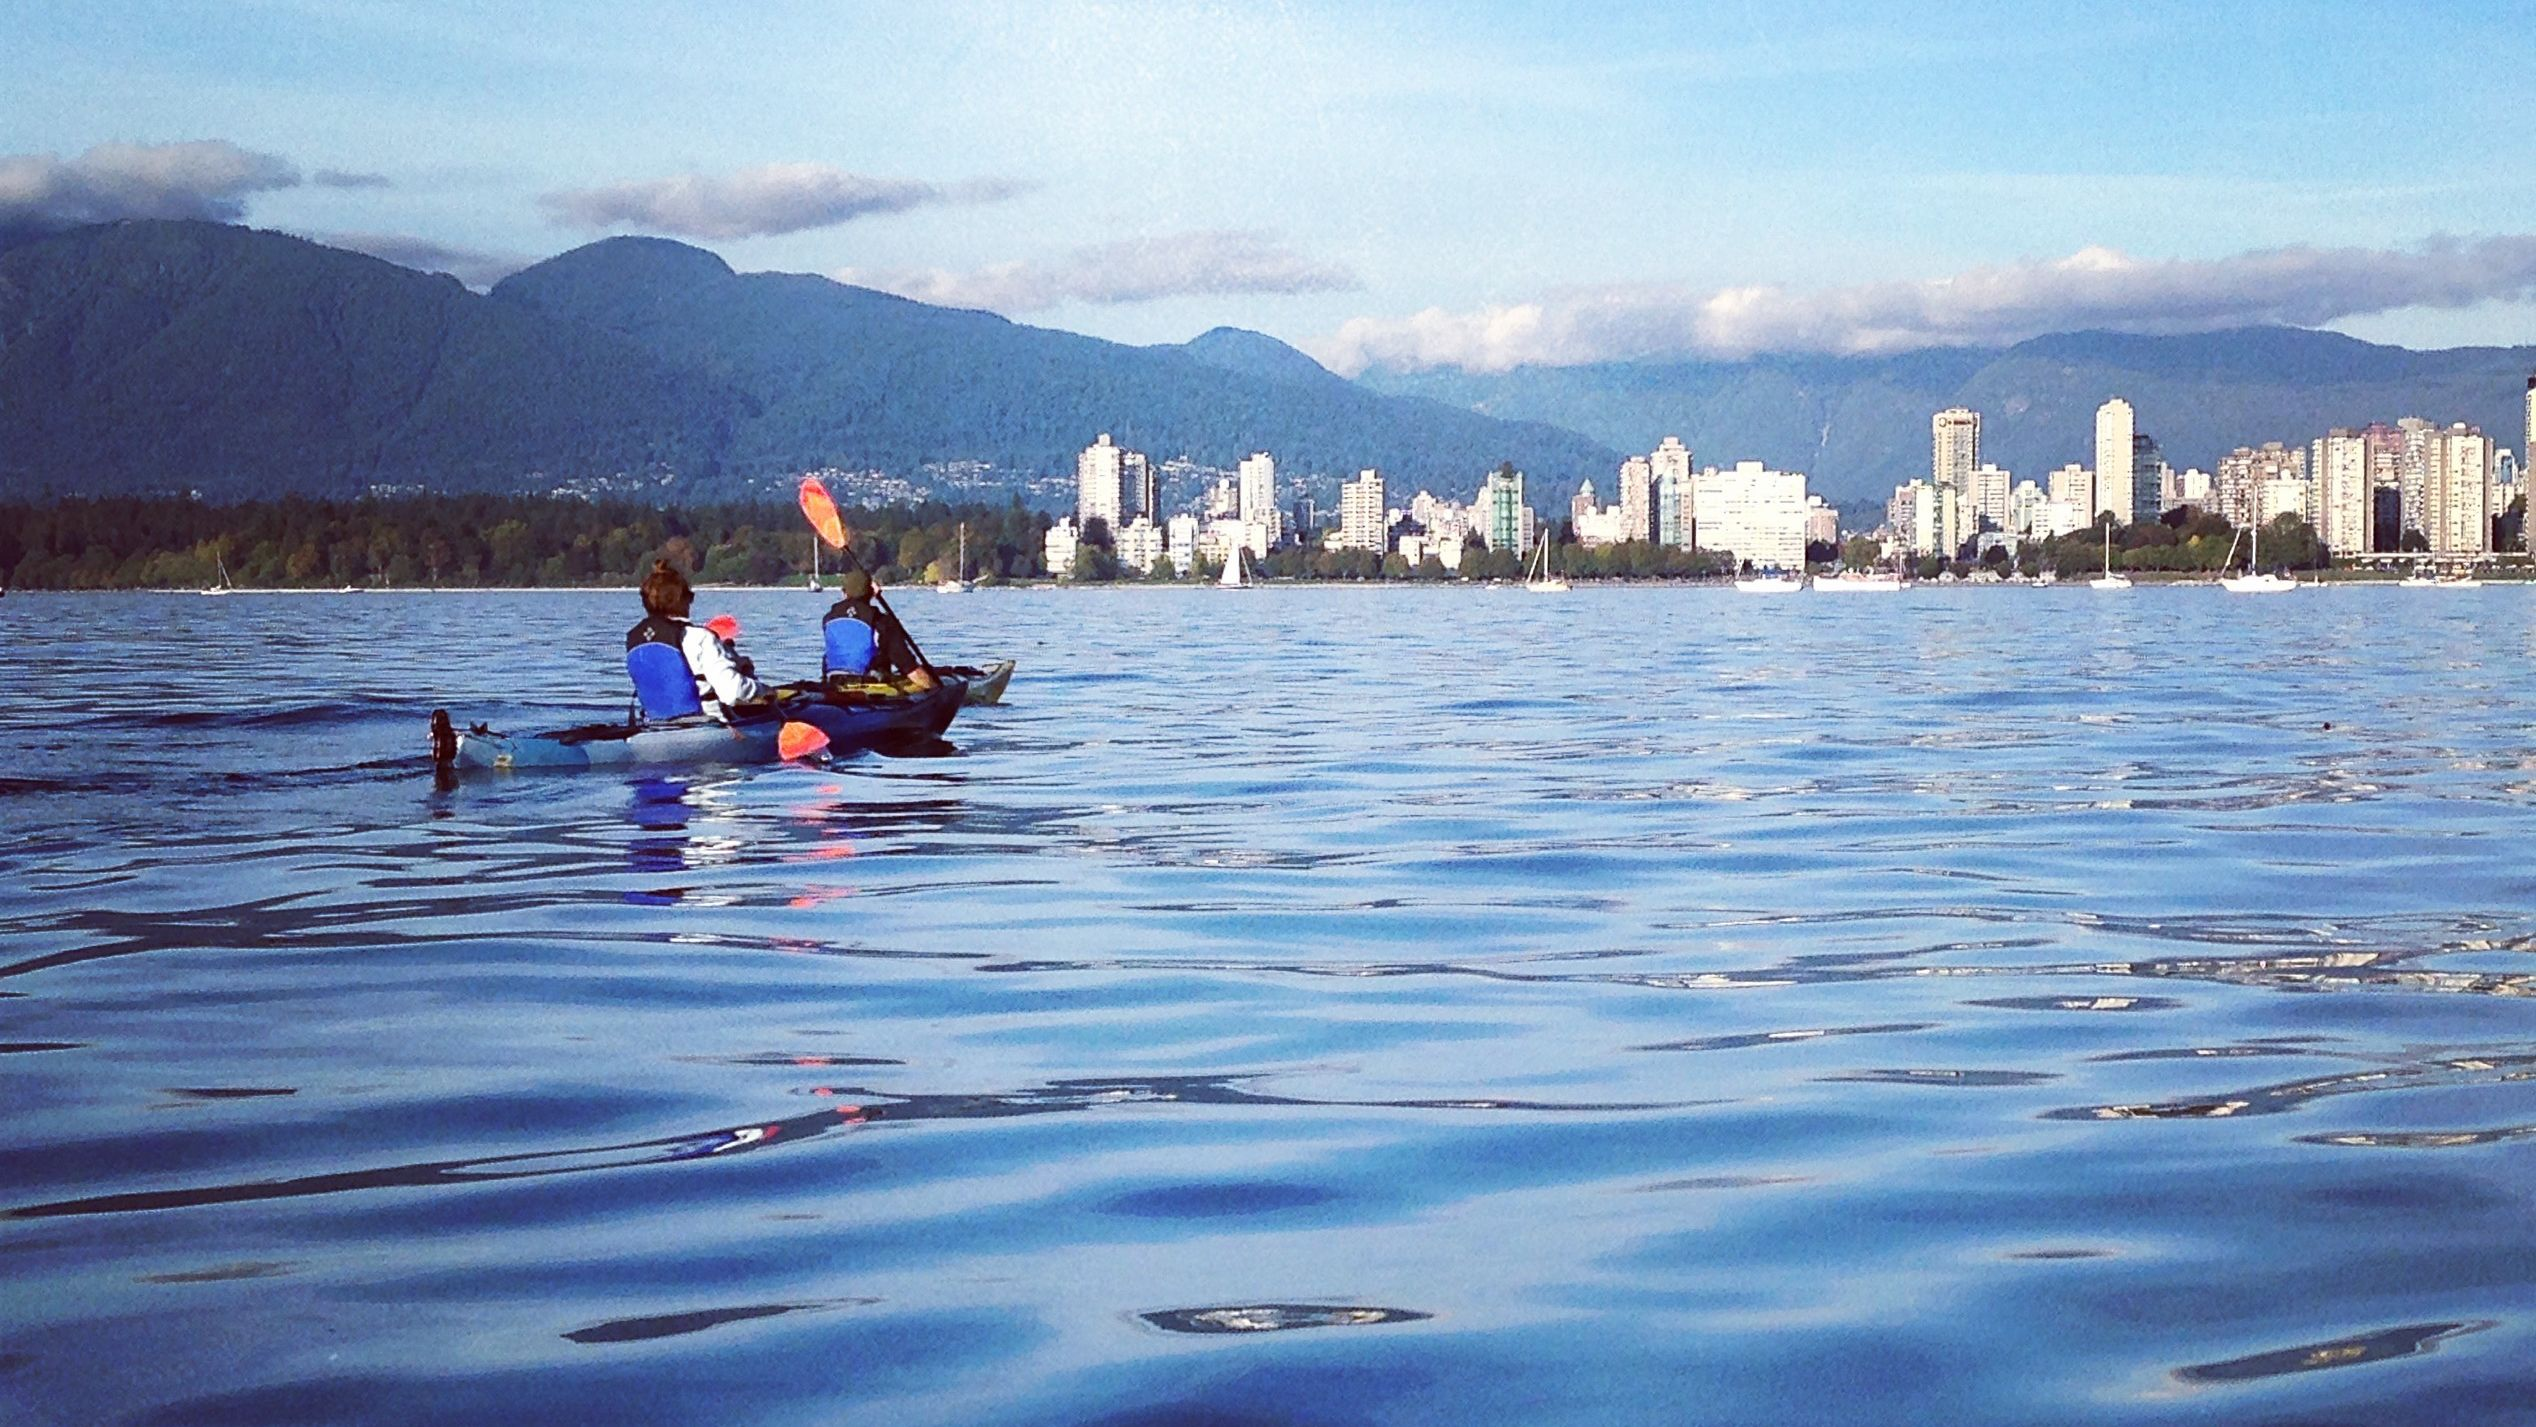 Kayakers paddling across river.